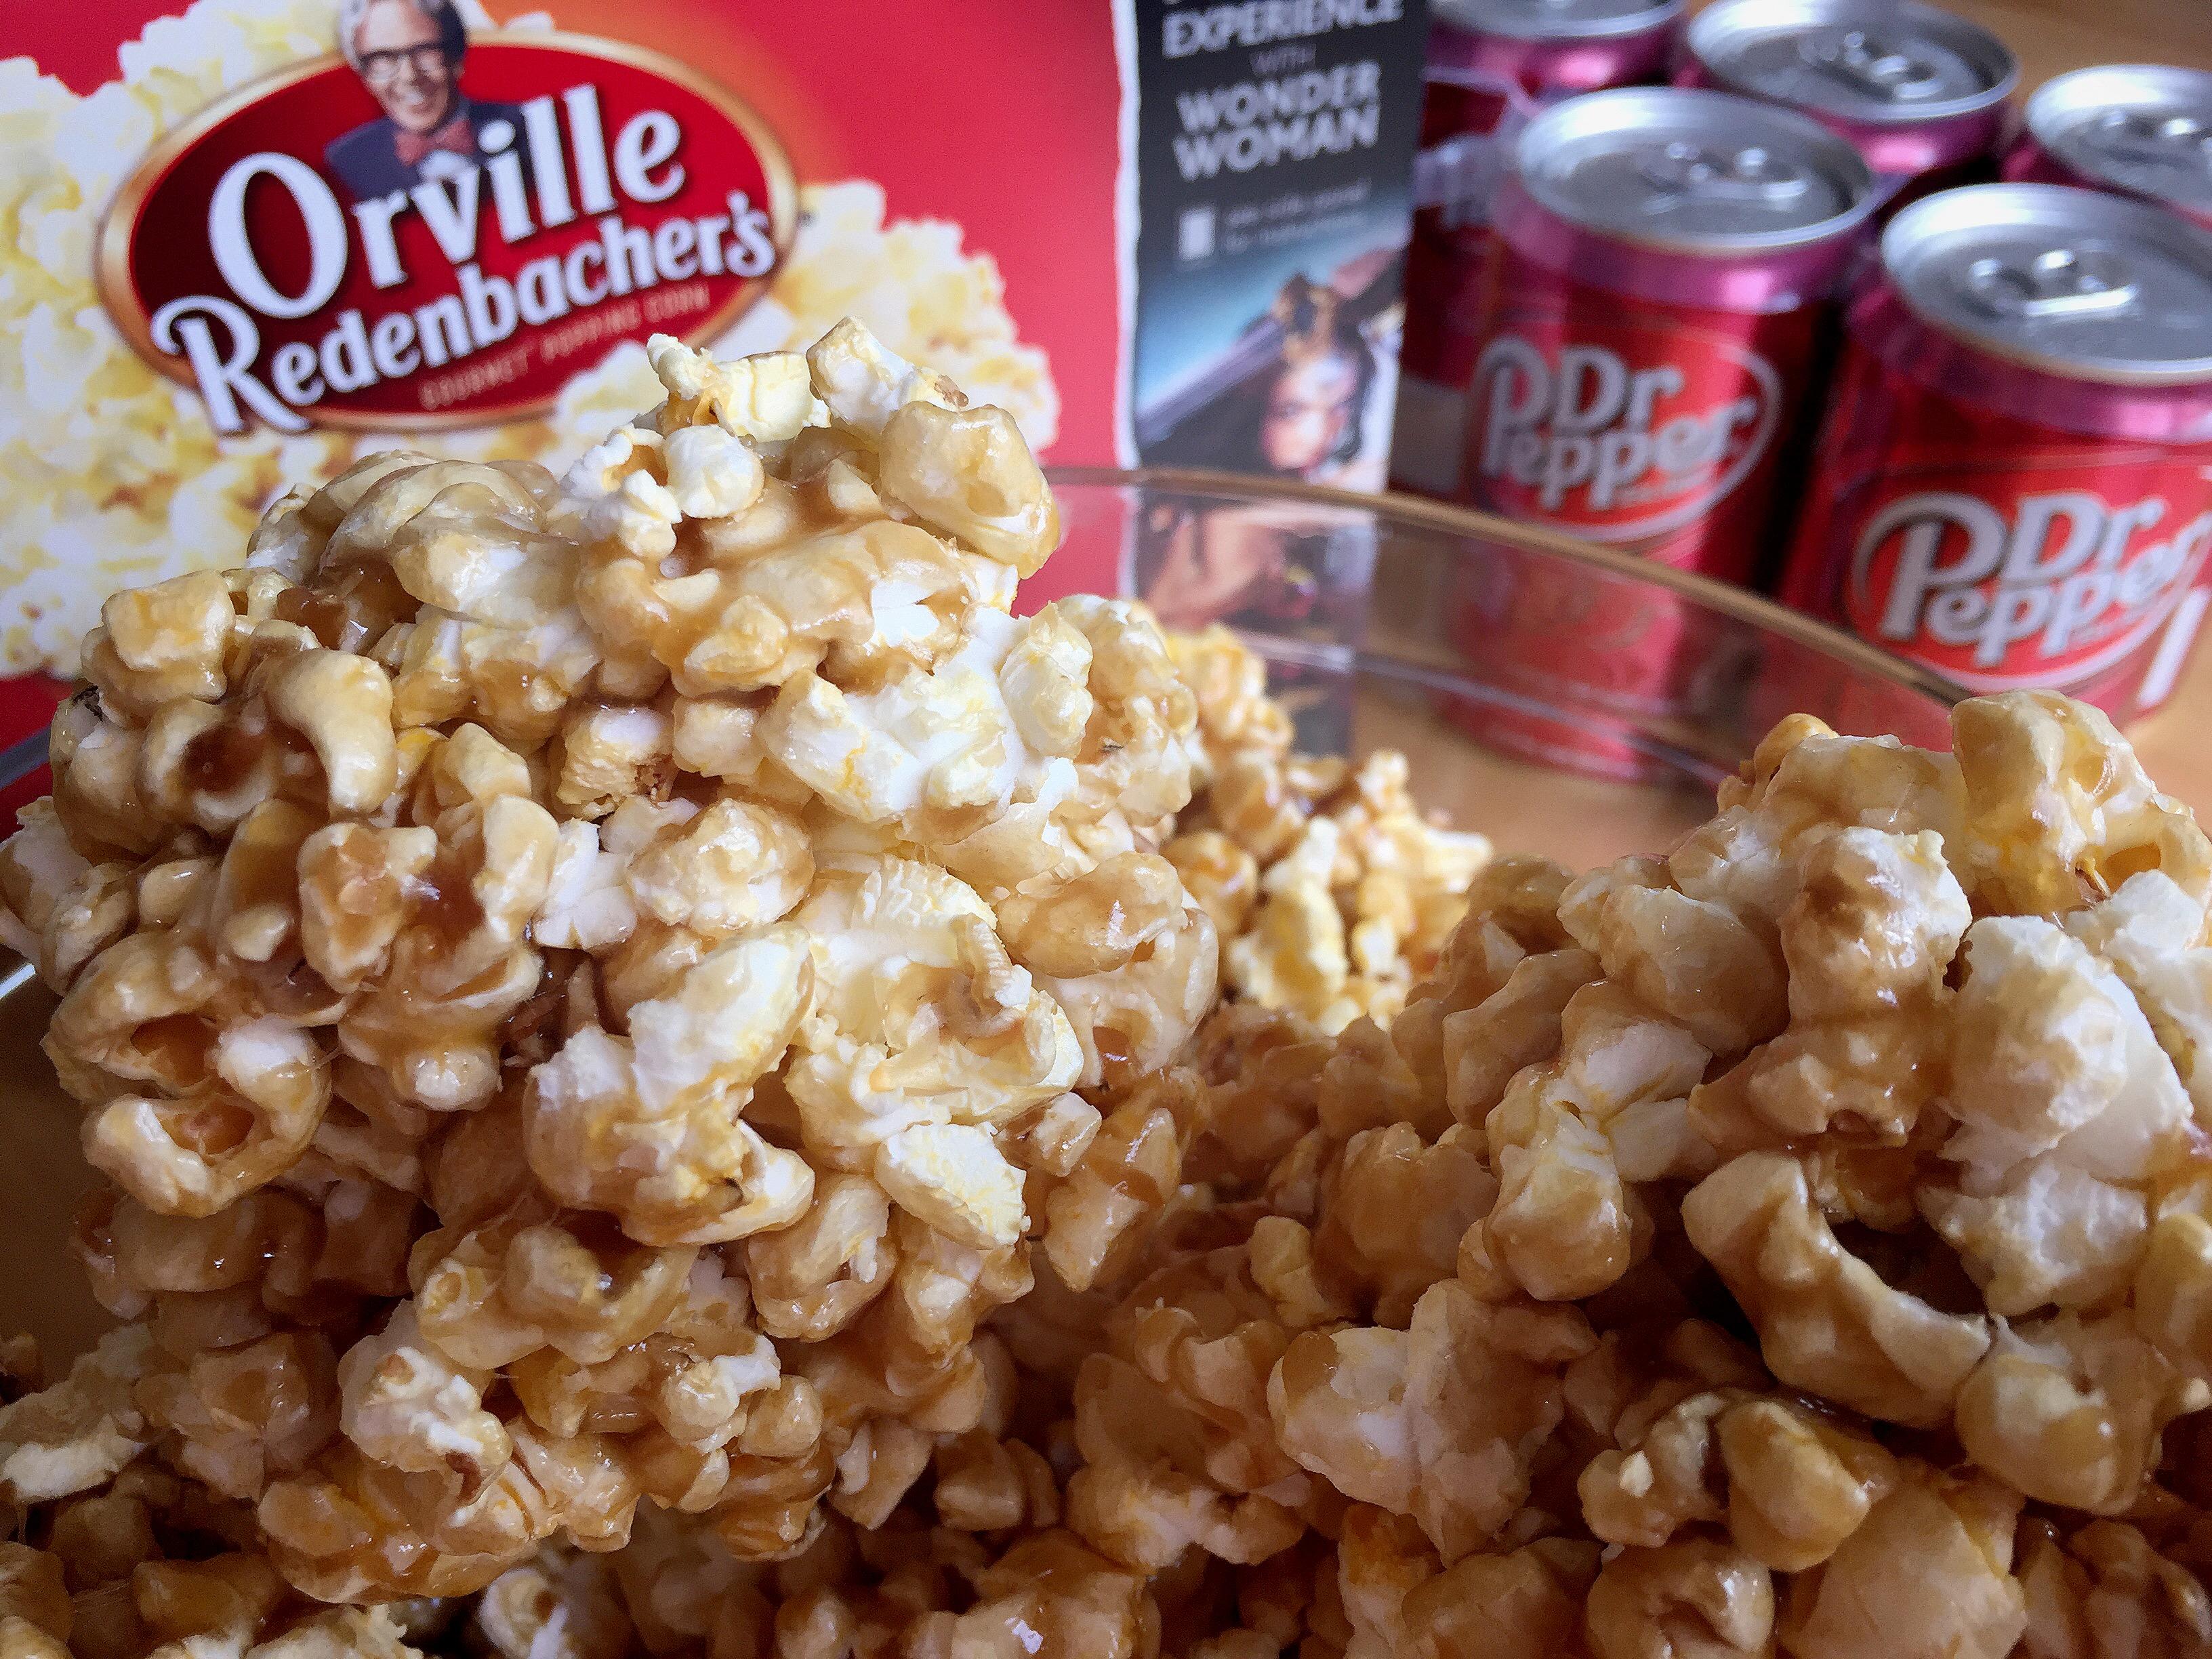 The Best Popcorn Ball Recipe For A Wonderful Movie Night © www.roastedbeanz.com [AD] #WonderfulMovieNight #WonderWoman #CollectiveBias #shop